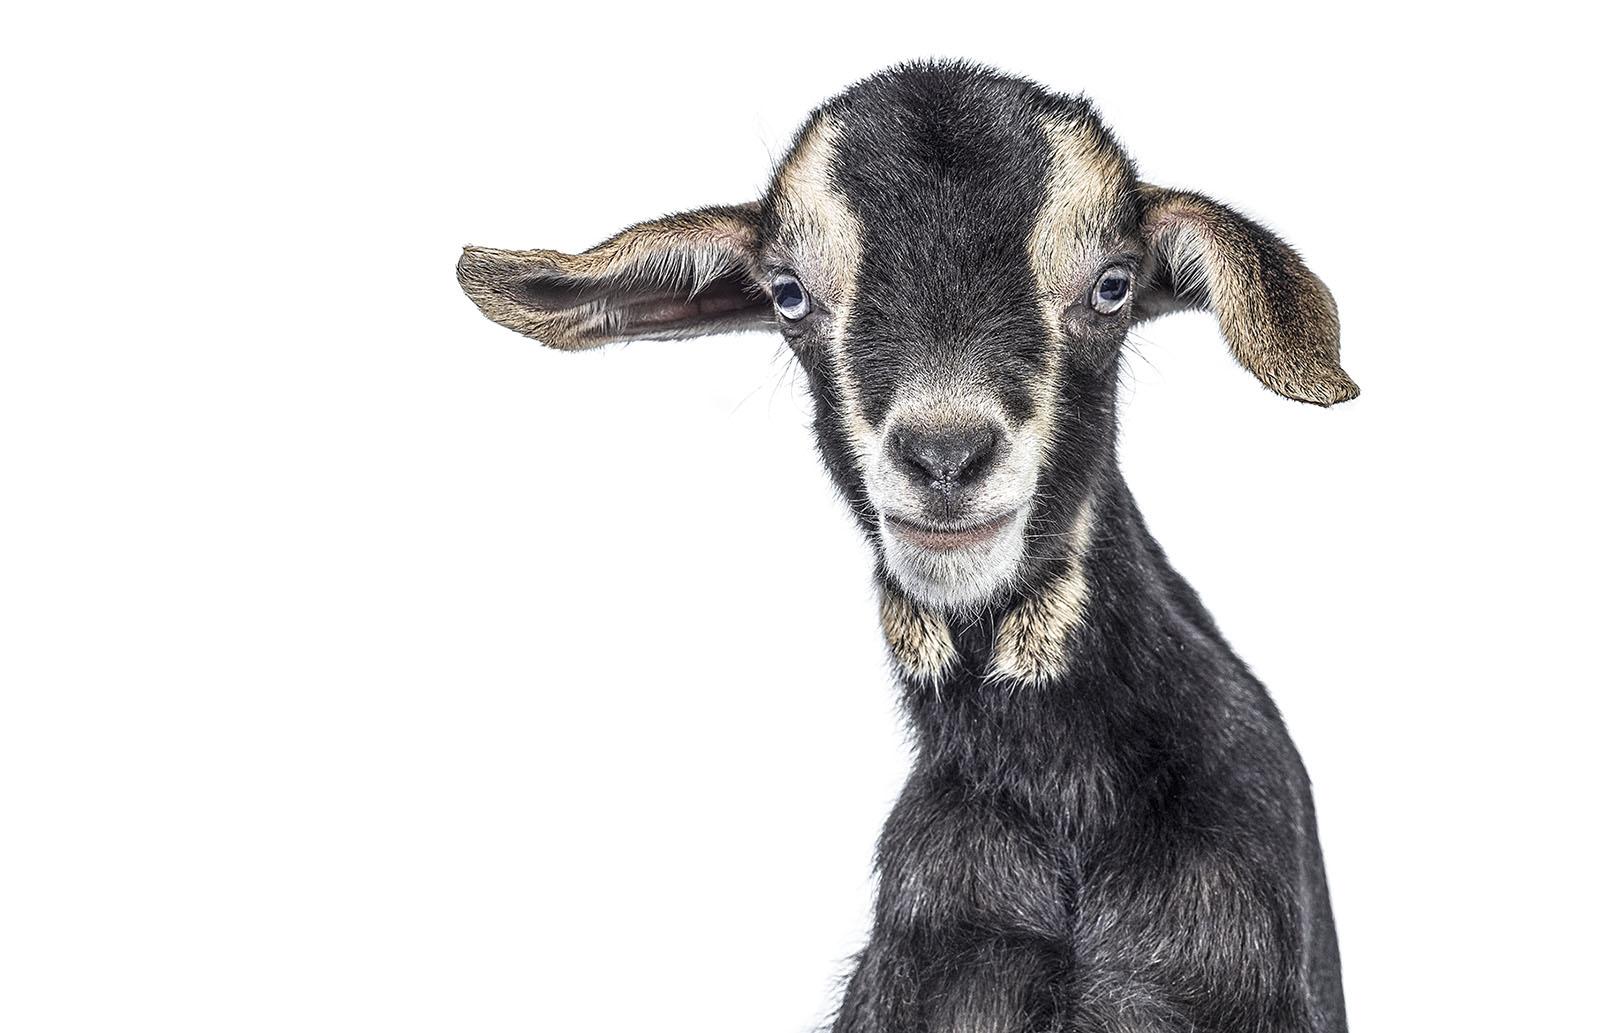 2014_011_ErnestGoh_HayDairies_Goat-419A-2